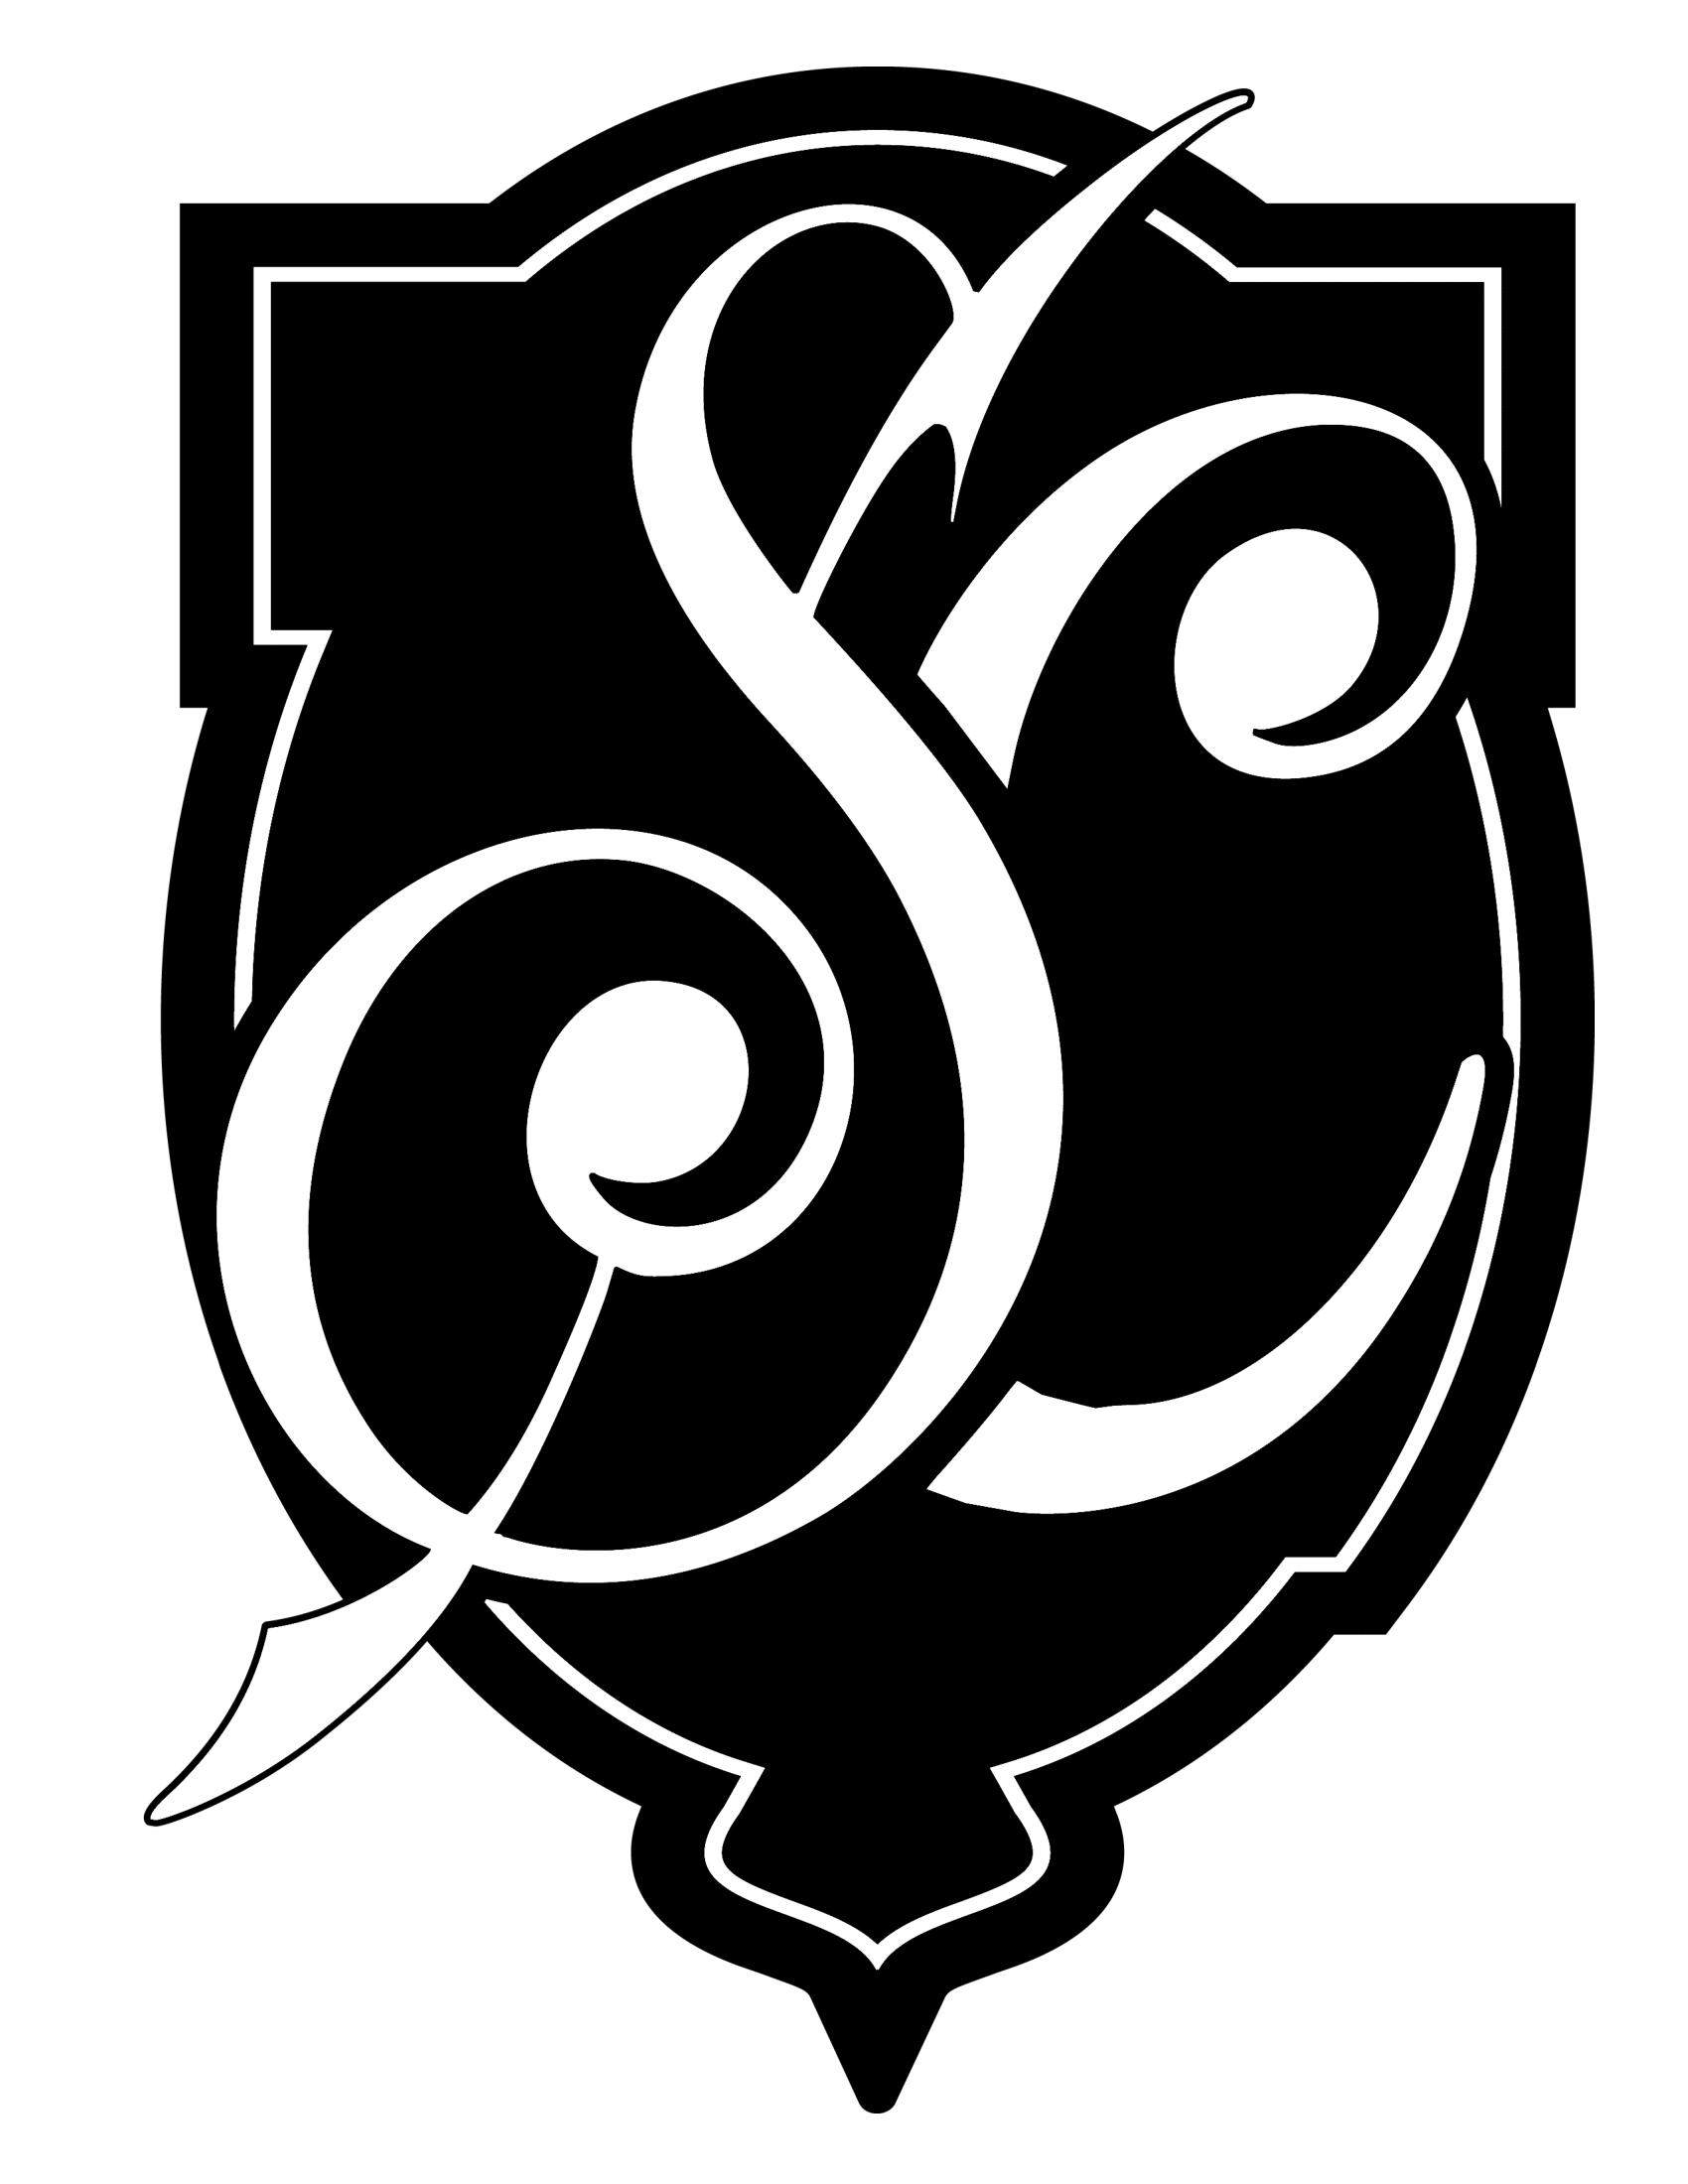 Stone Crest Golf Community